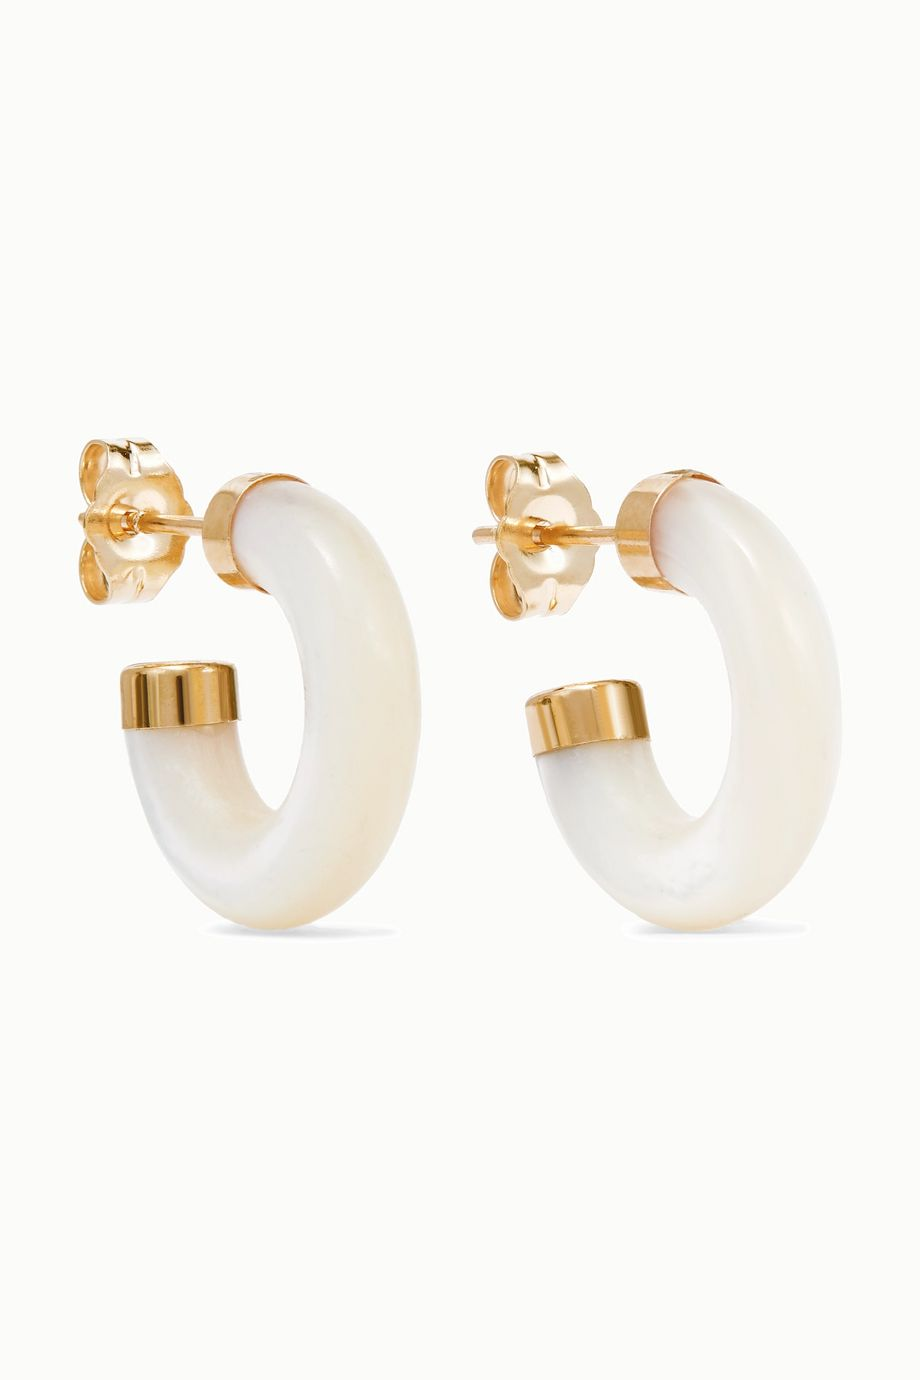 Loren Stewart Stone gold mother-of-pearl hoop earrings